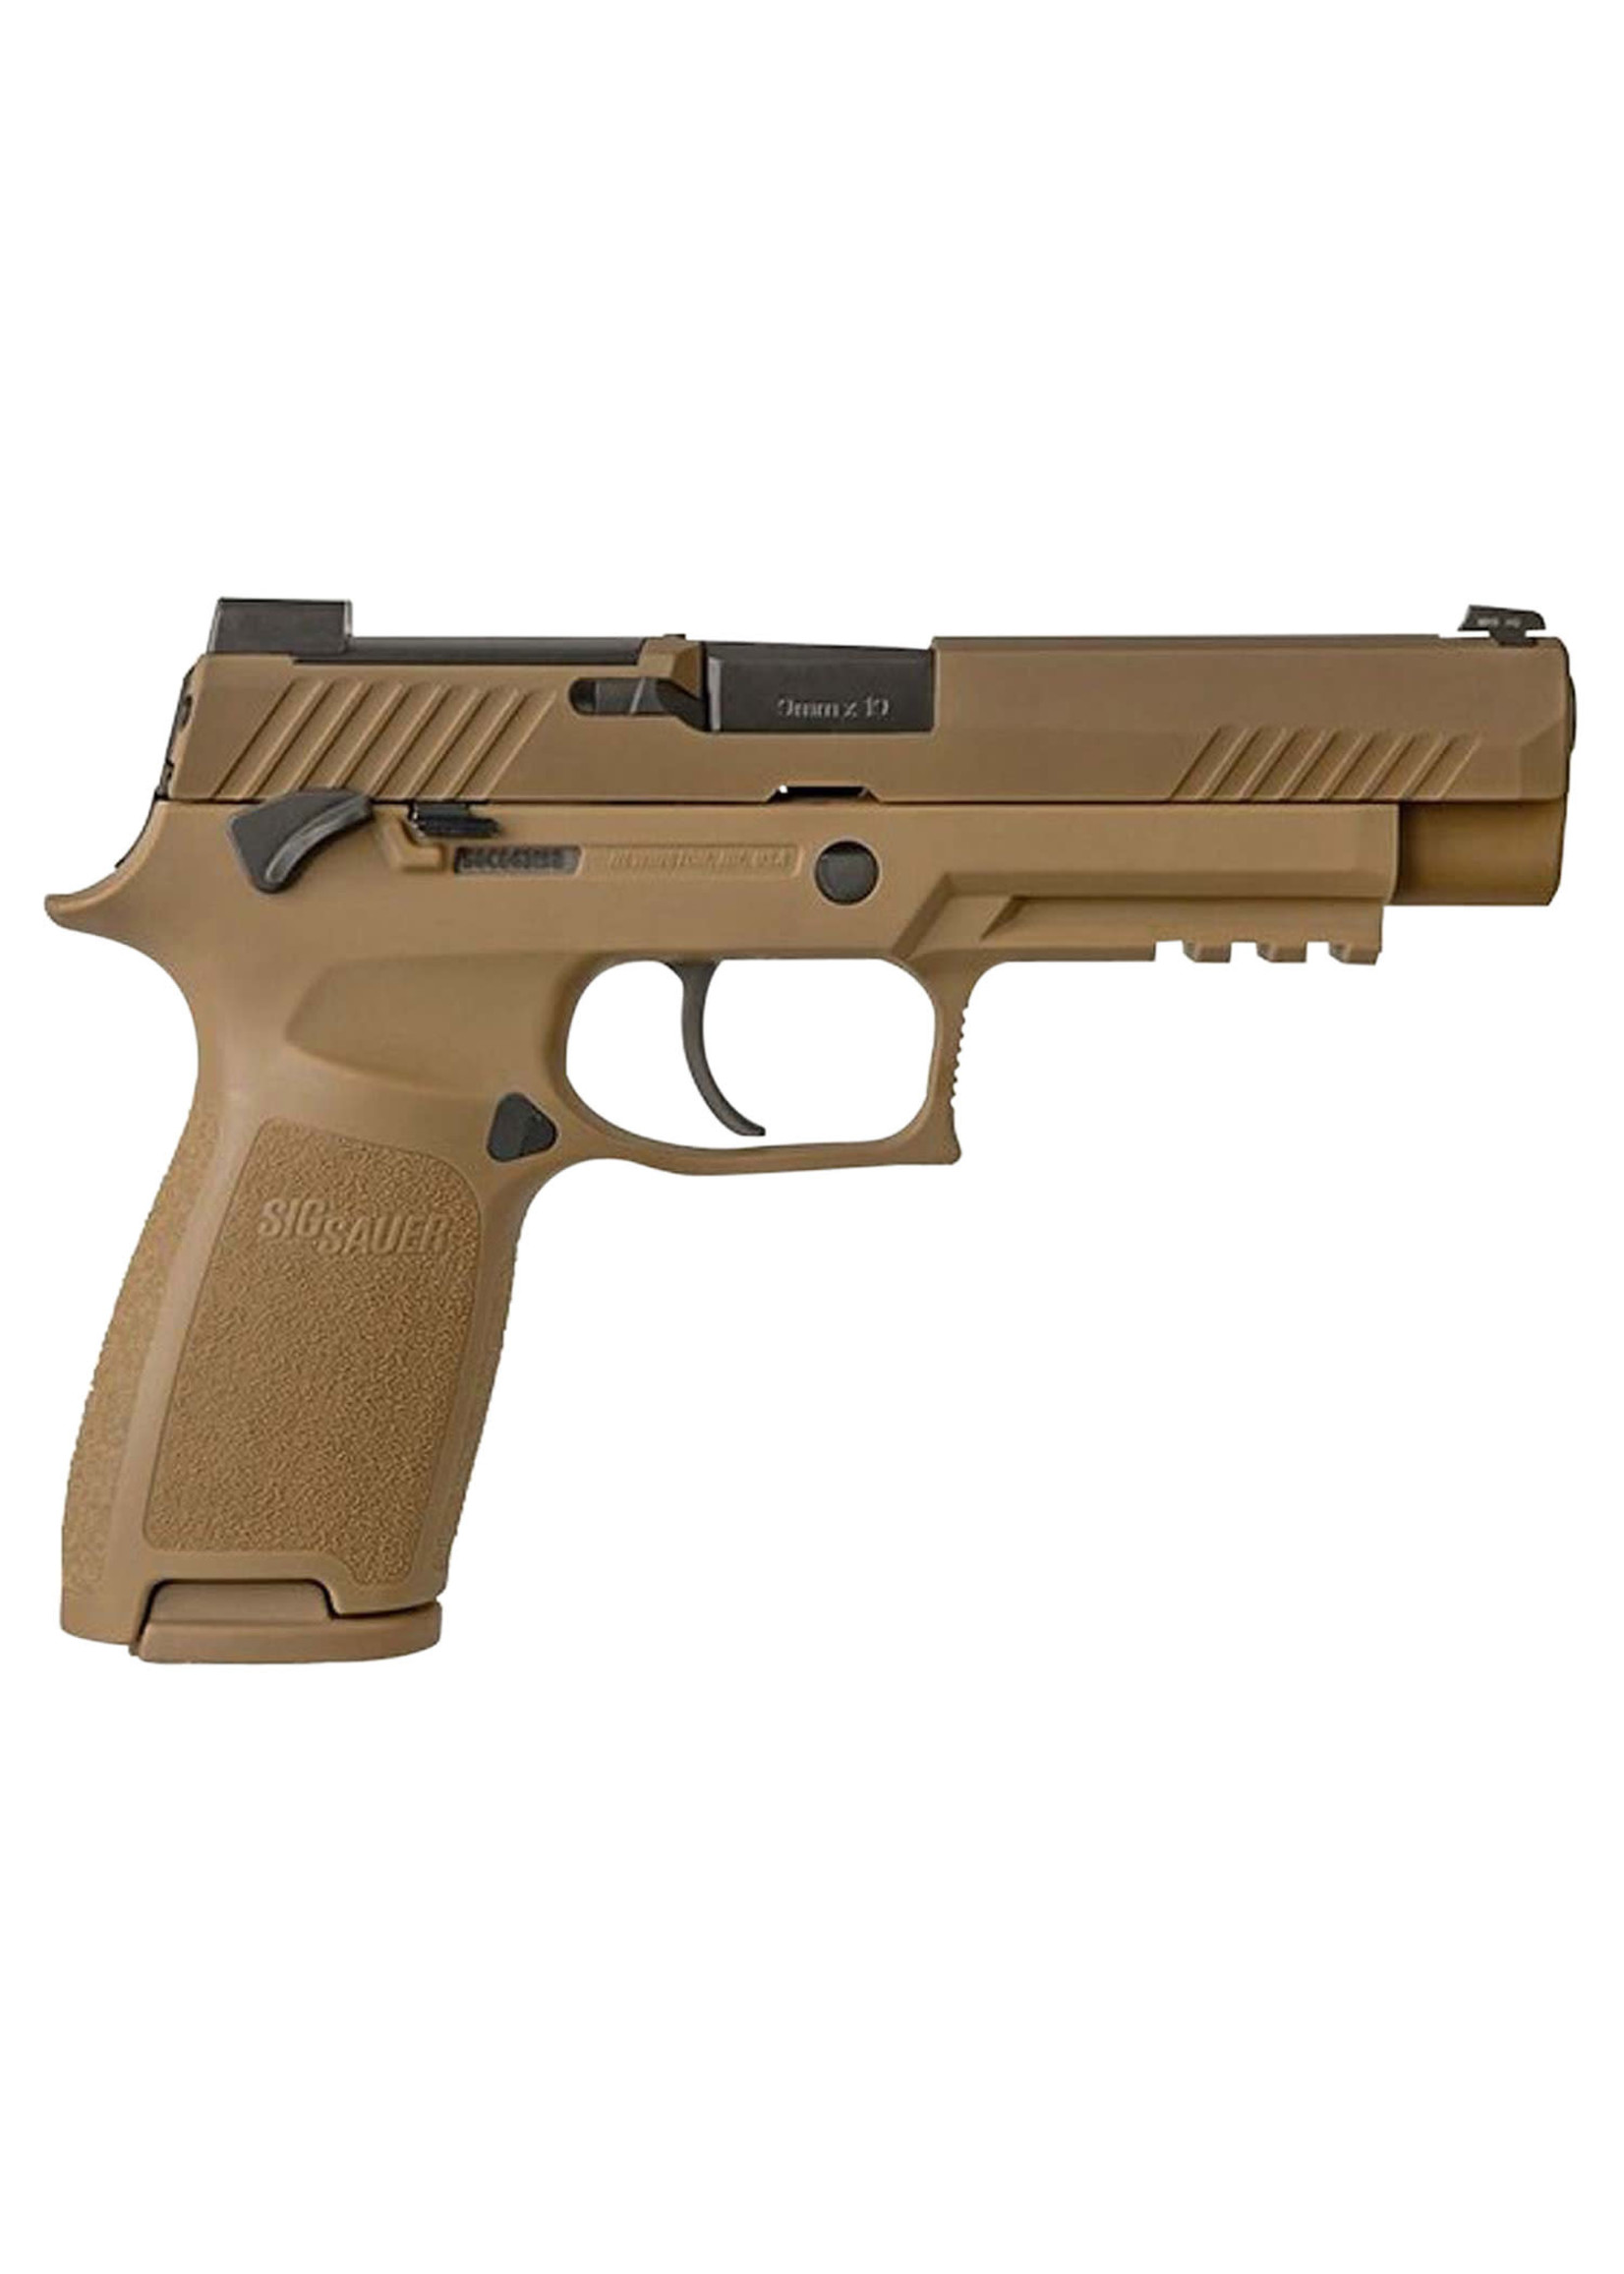 "Sig Sauer Sig Sauer P320 M17 9mm Luger 4.70"" 17+1, 21+1, Coyote"